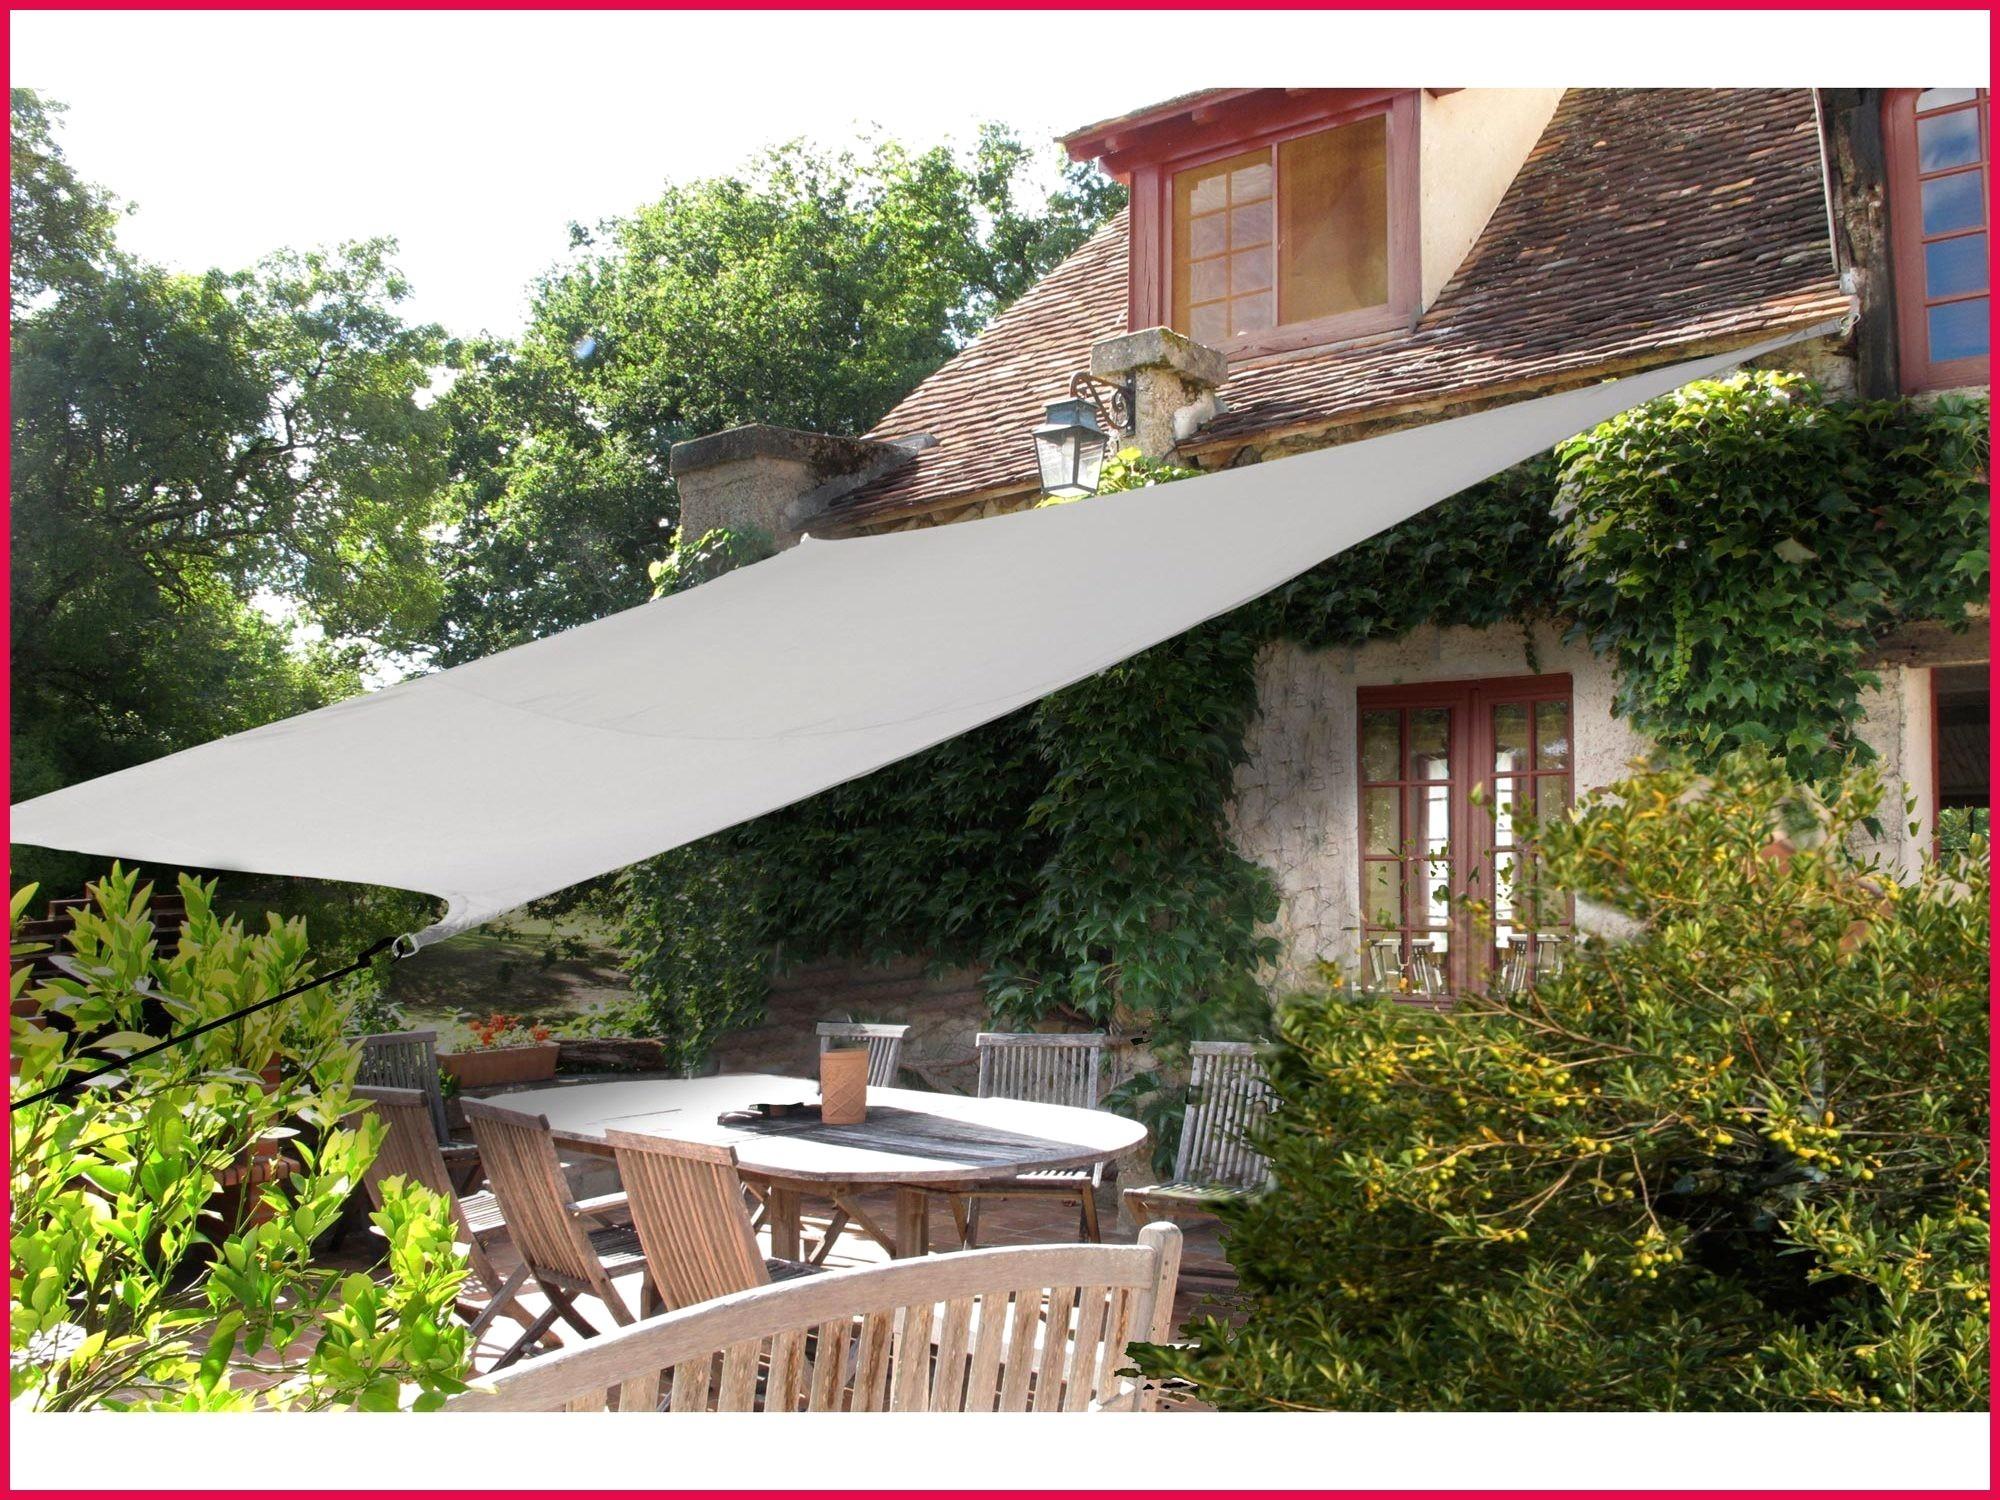 Toile Jardin Triangle Voileombrage Ikea Beau Voile Ombrage ... destiné Toile Triangle Jardin